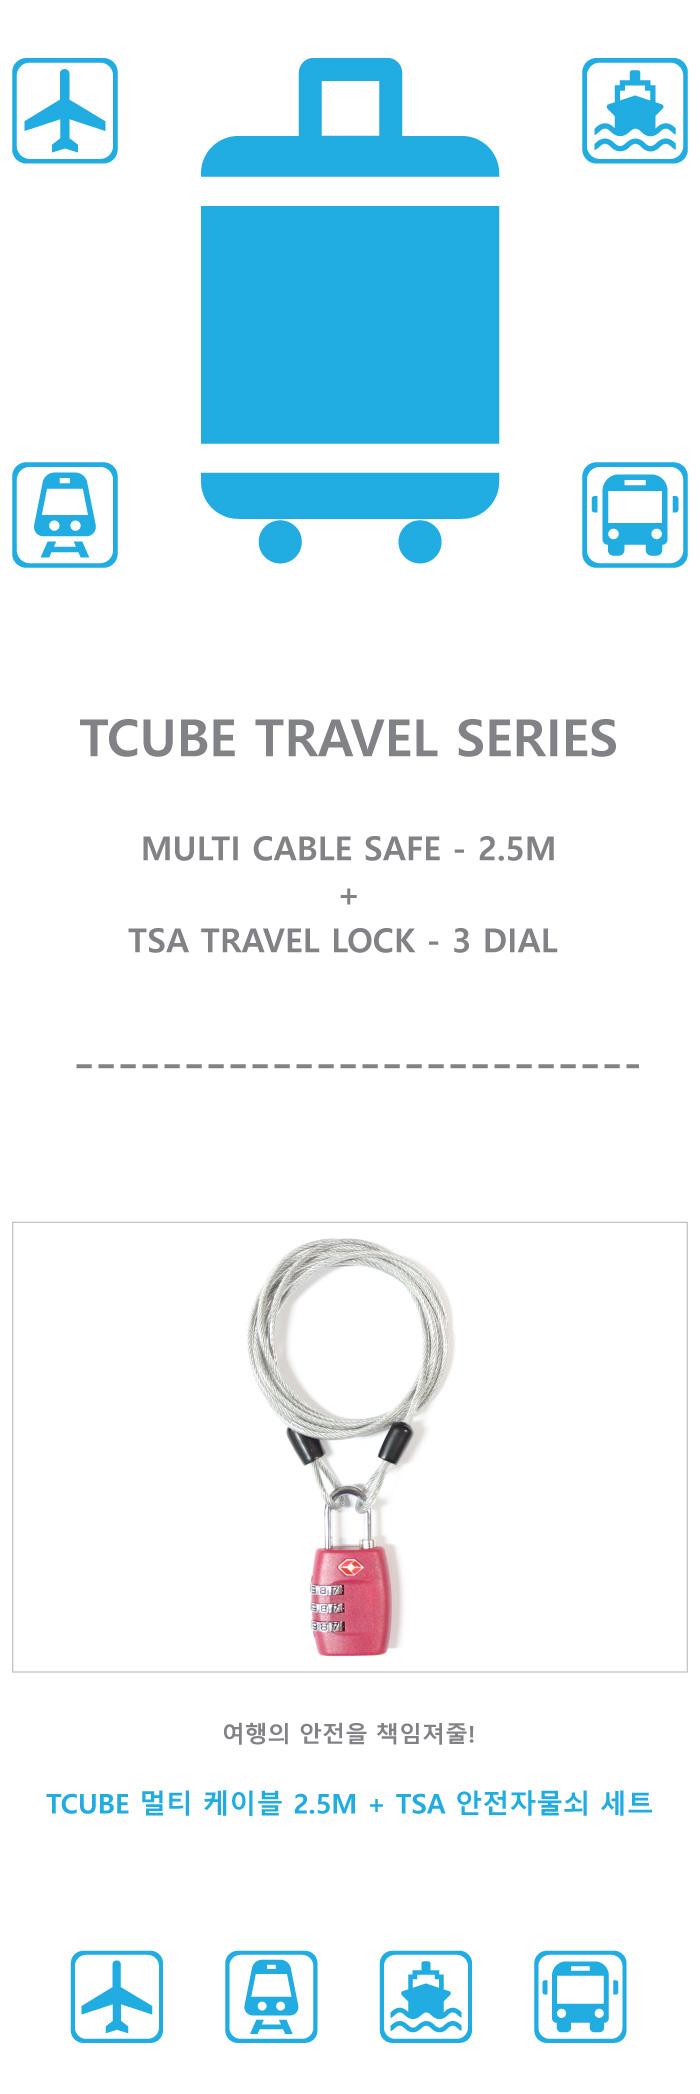 TCUBE - TSA 3다이얼 자물쇠 + 멀티 안전케이블 - 2.5M - 티큐브, 10,800원, 보호용품, 자물쇠